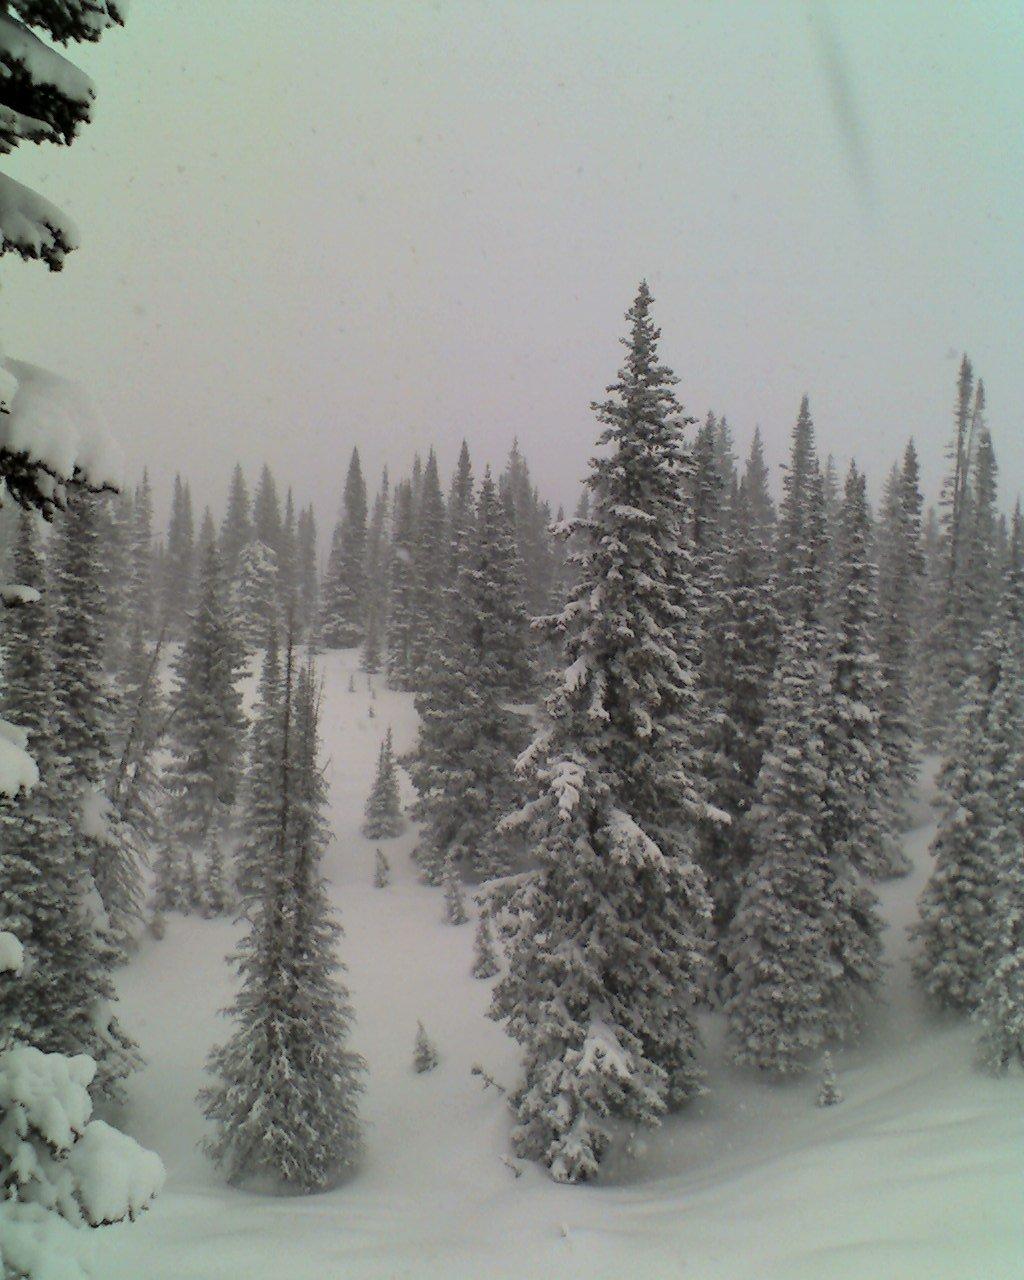 Skiing - 16 of 18